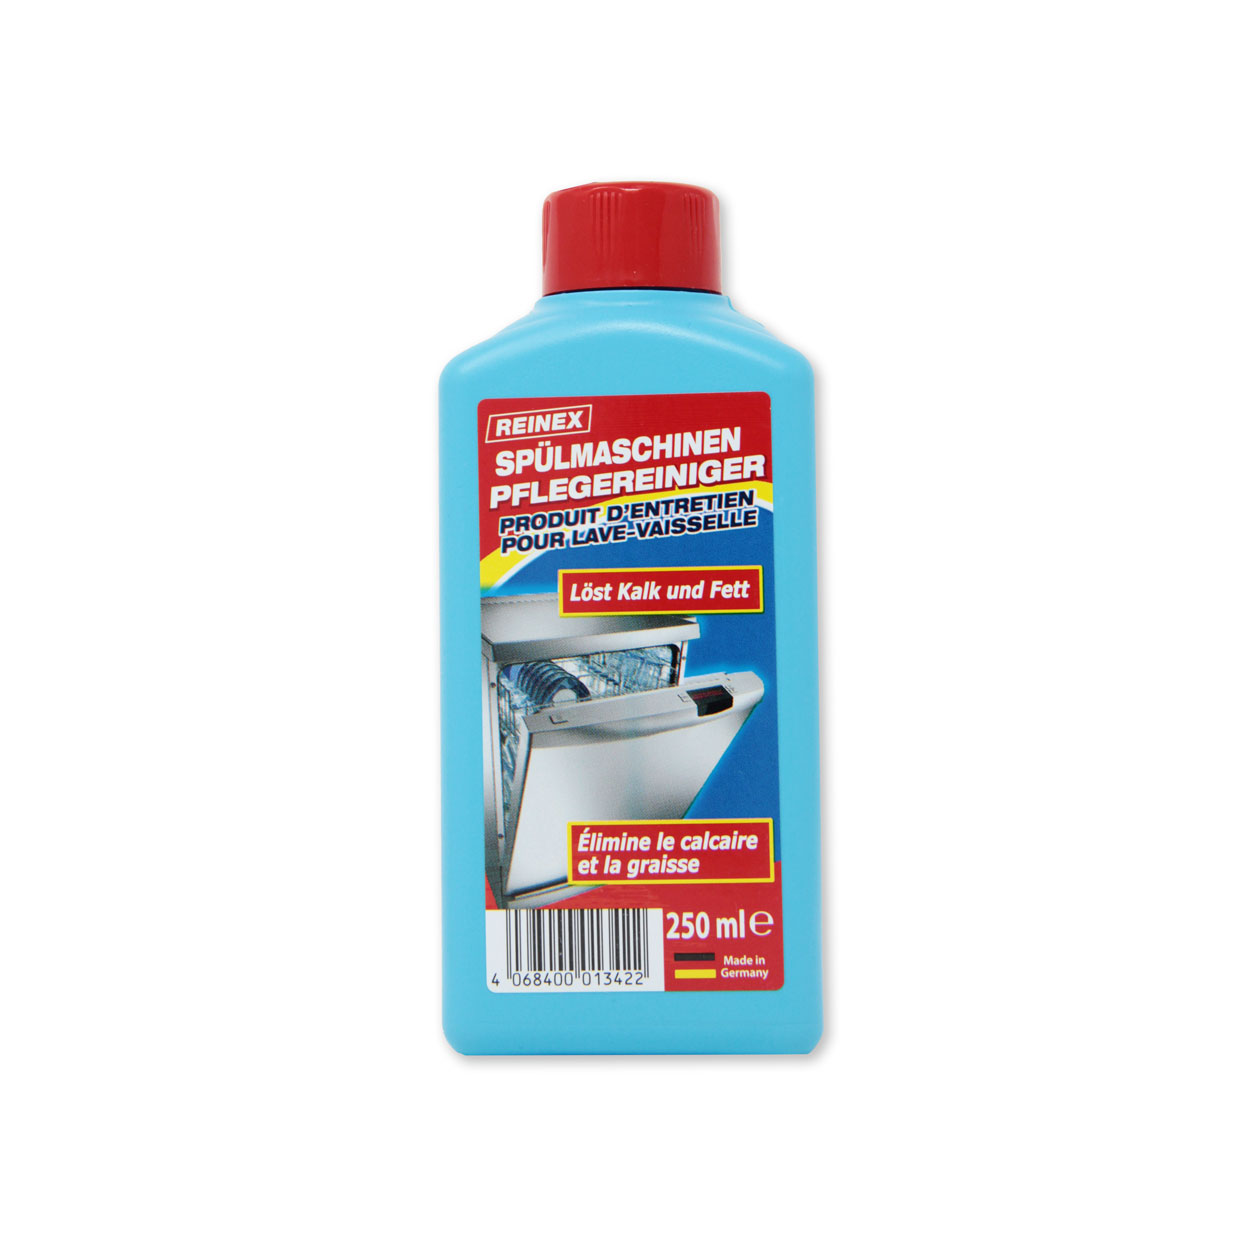 Reinex Maschinenpfleger - 250 ml - Flasche